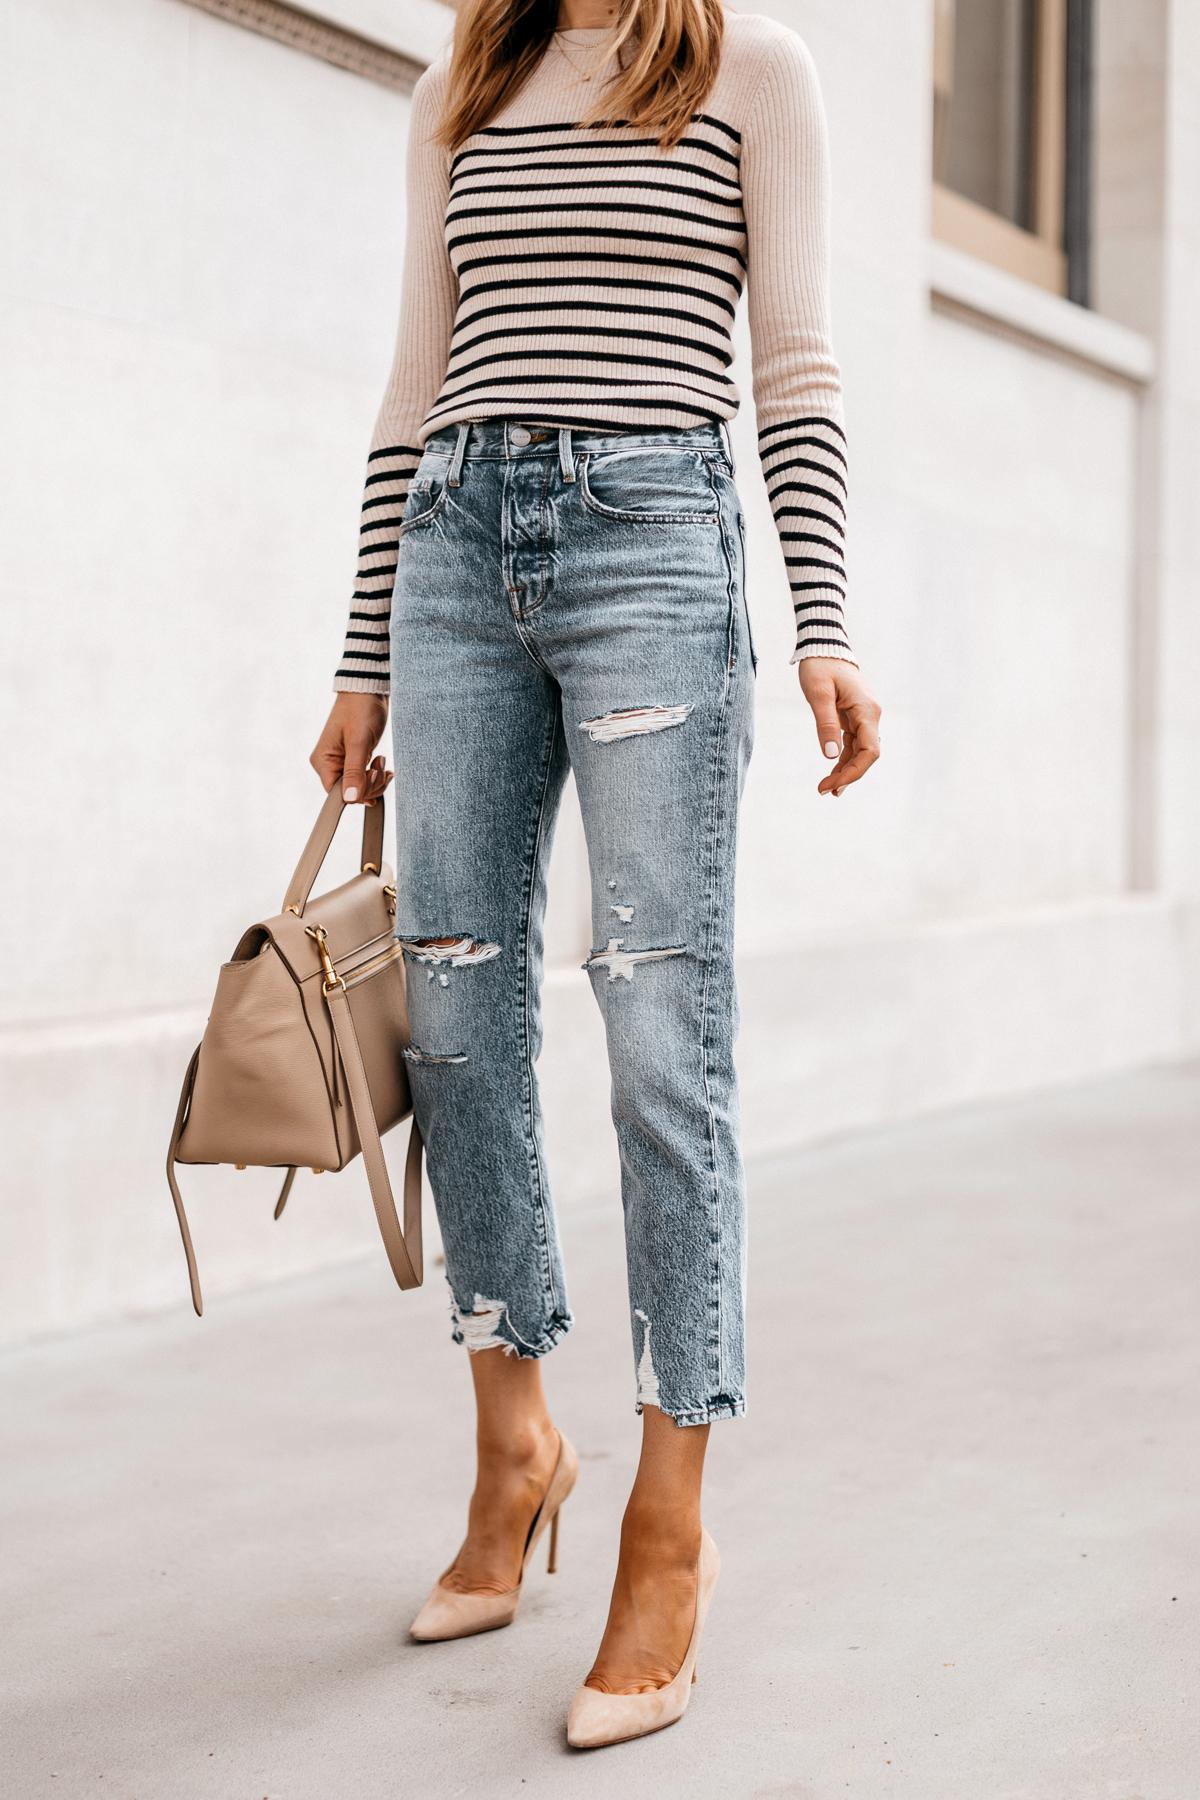 Fashion Jackson Wearing Rag and Bone Striped Long Sleeve Top Frame Ripped Boyfriend Jeans Nude Pumps